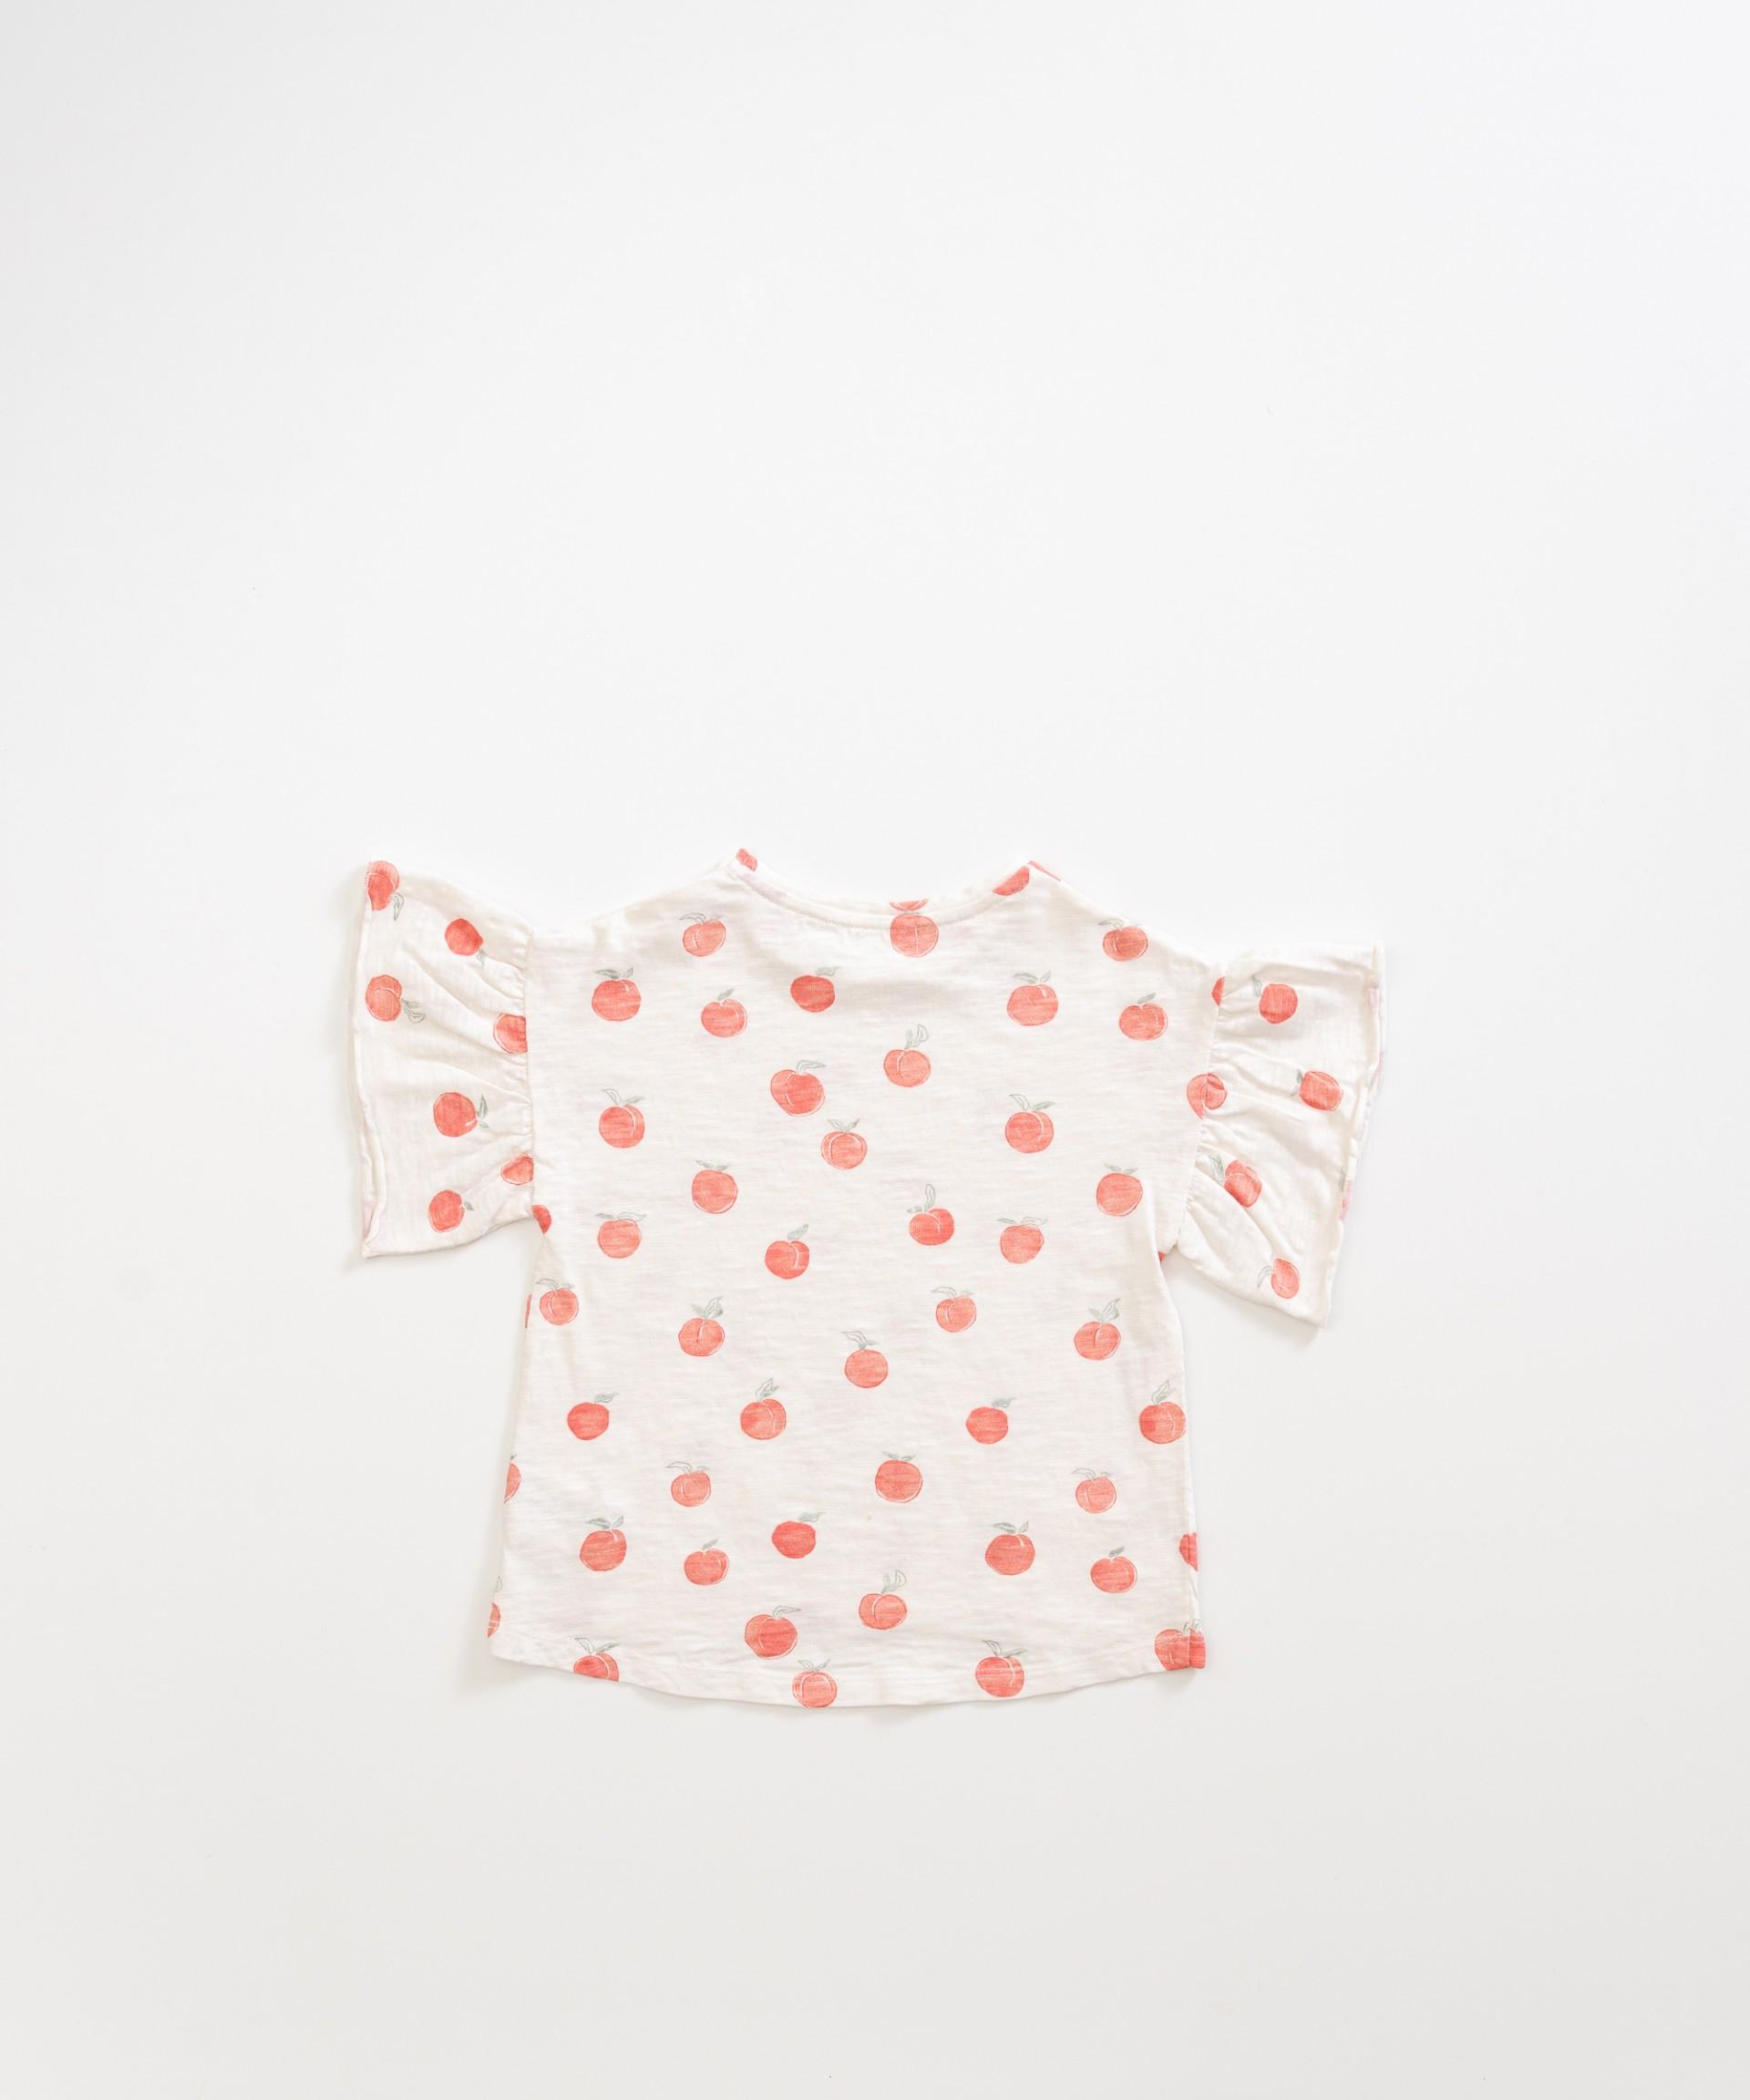 Short-sleeved t-shirt in organic cotton | Weaving